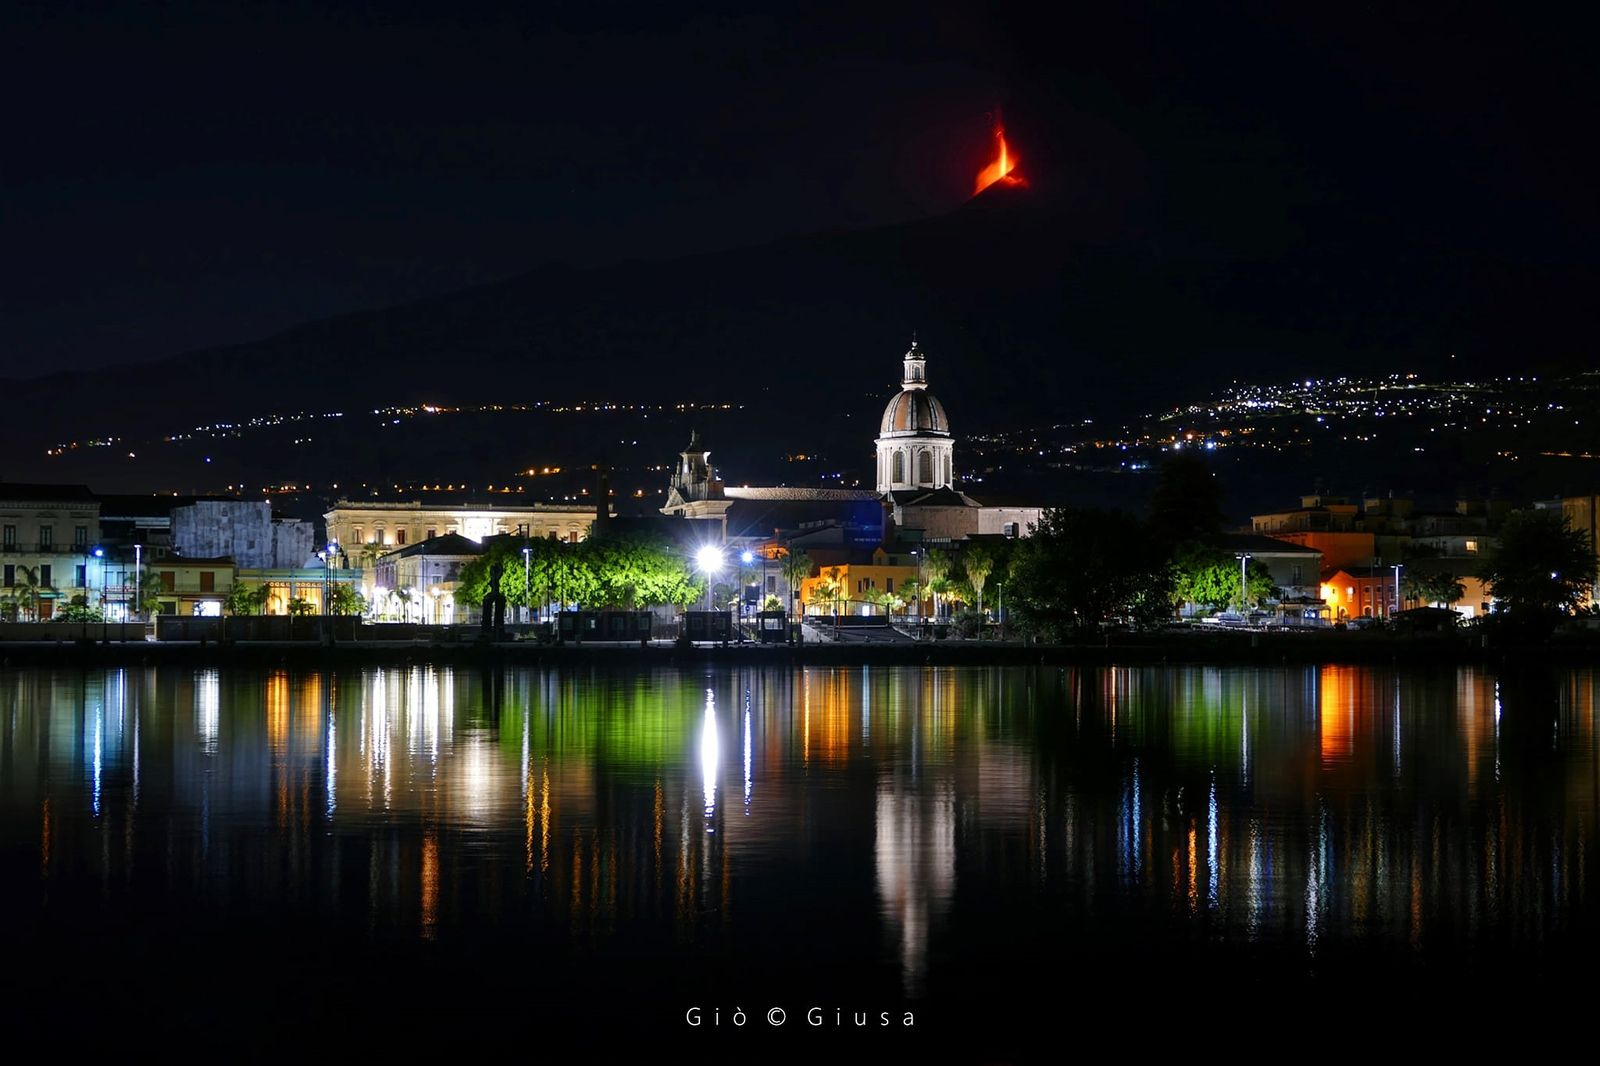 Etna SEC - 24.05.2021 - lava fountain, view of Marina di Riposto - photo Gio Giusa - one click to enlarge all photos